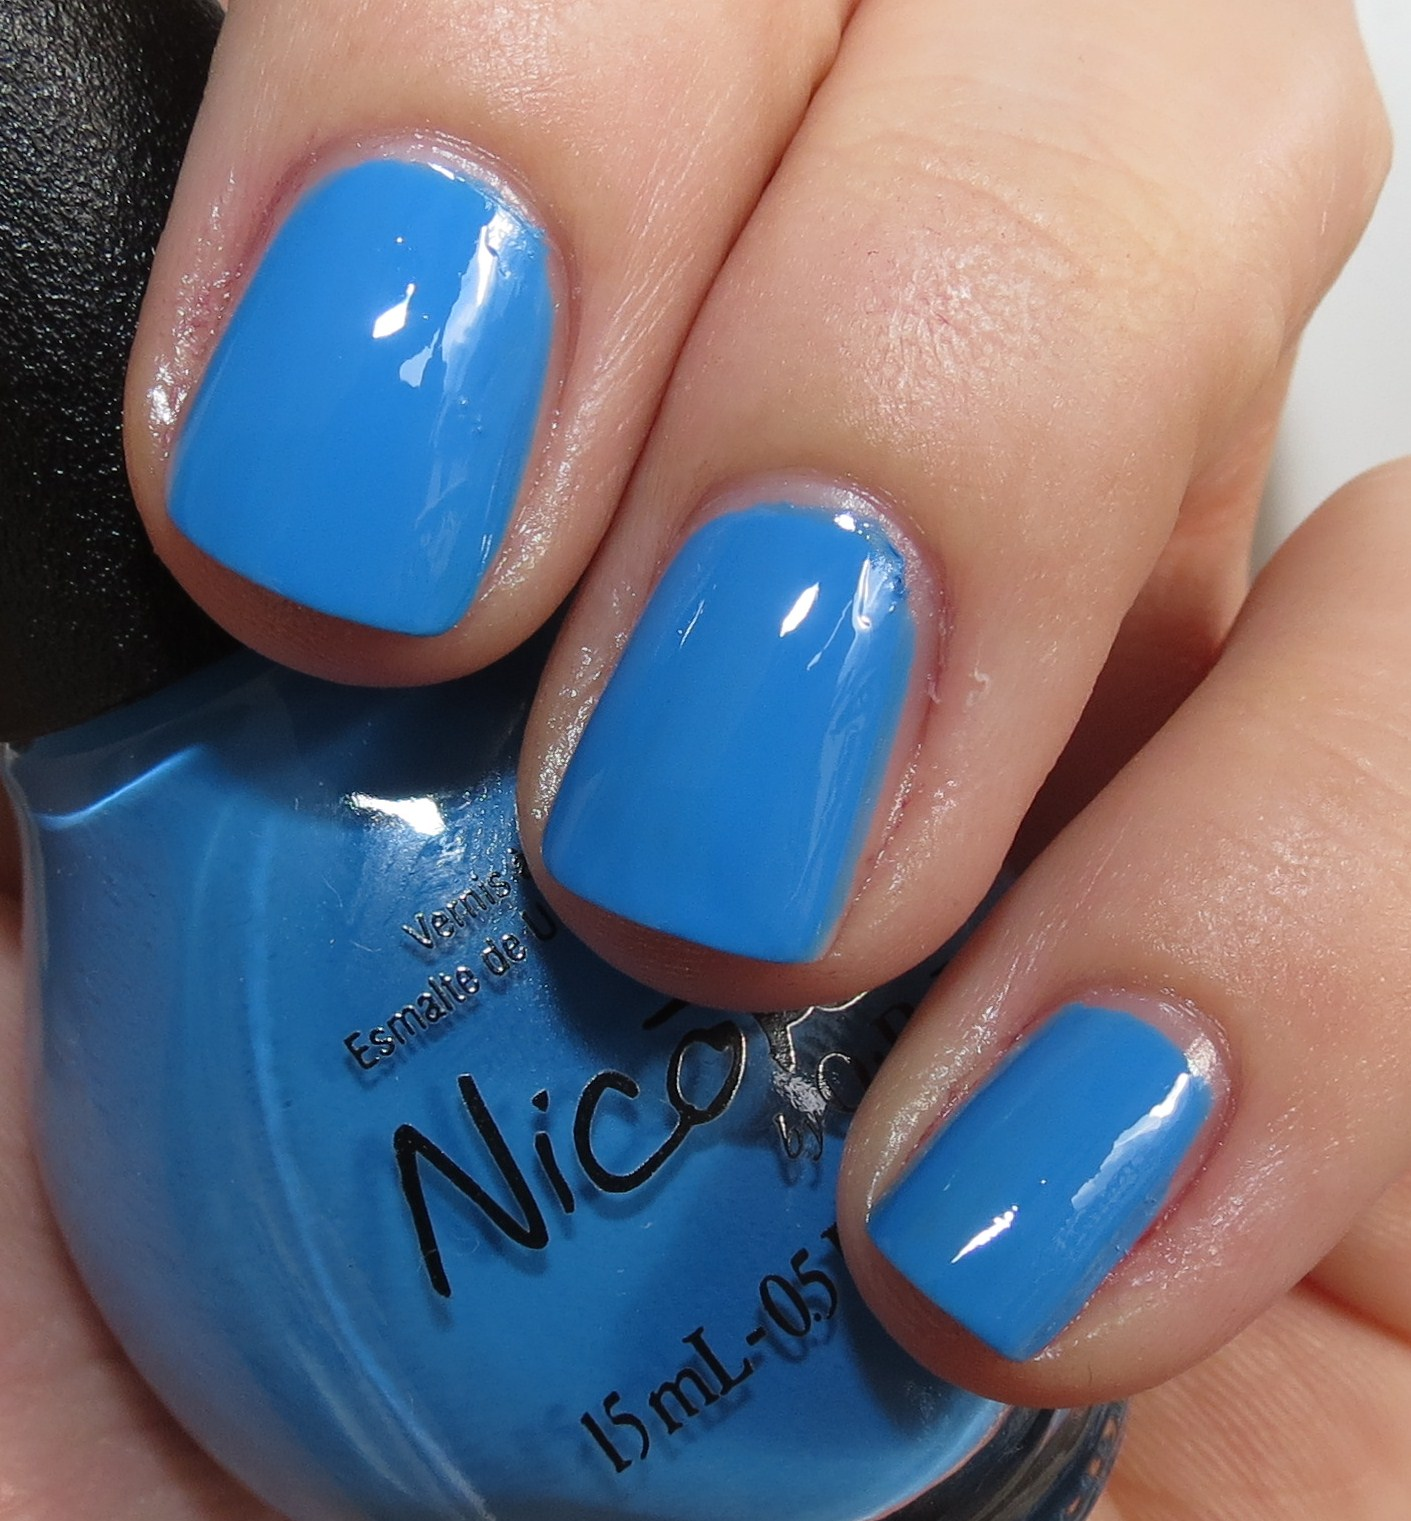 Nicole by OPI Nail Polish Lacquer I Sea You and Raise Light Blue ...